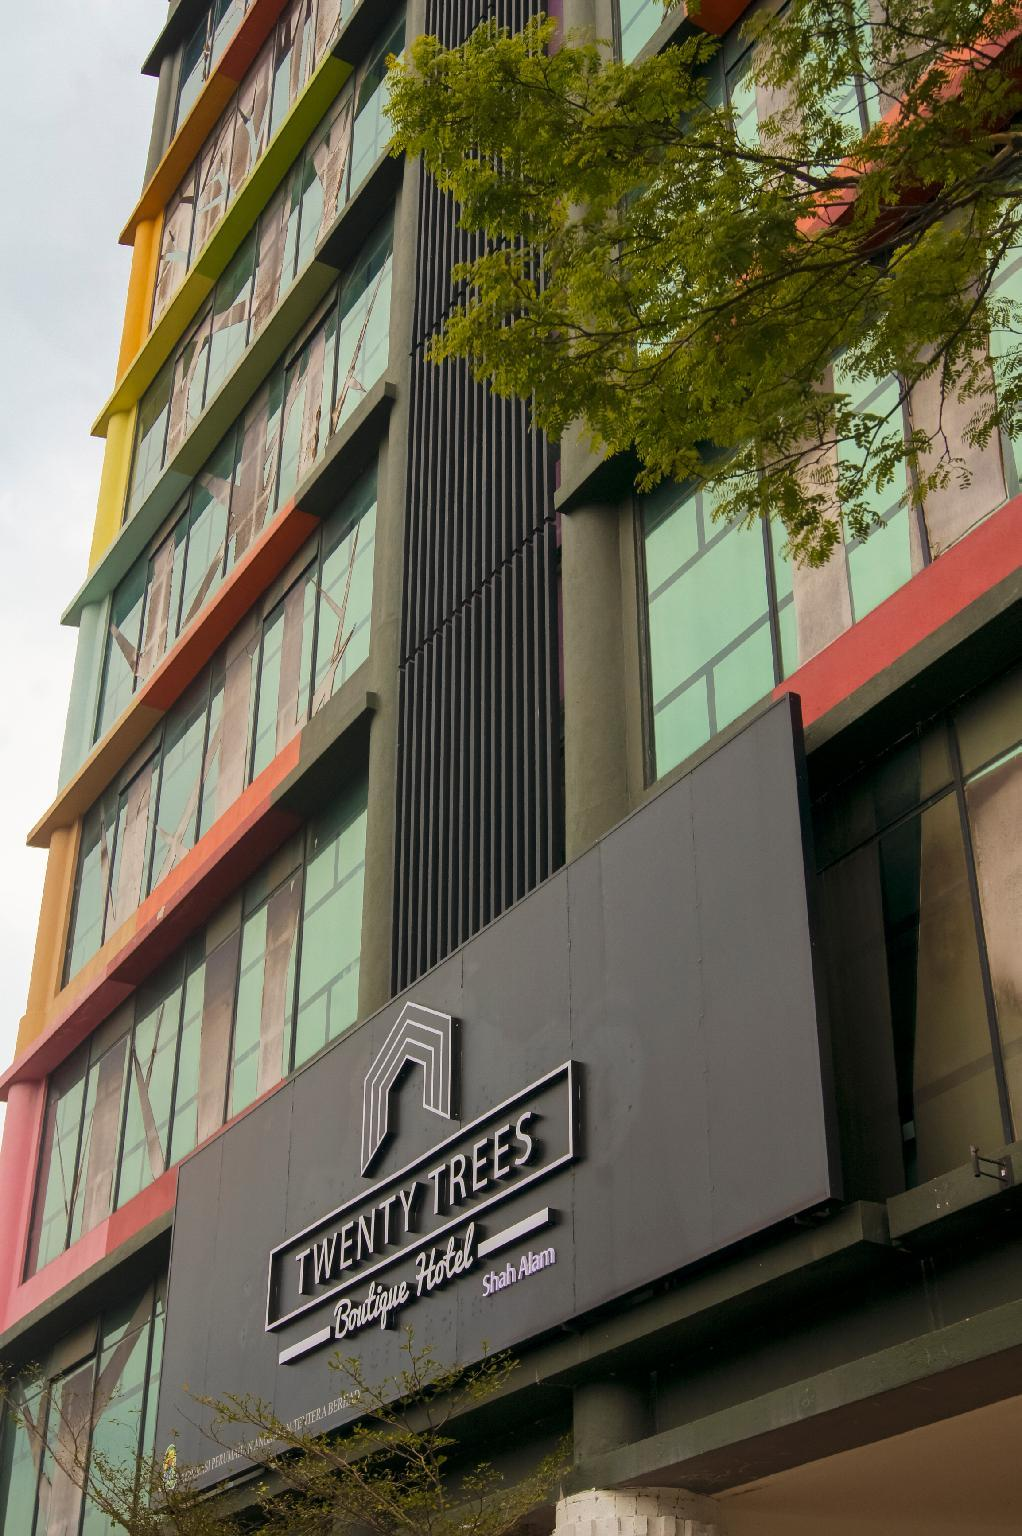 Twenty Trees Boutique Hotel, Kuala Lumpur